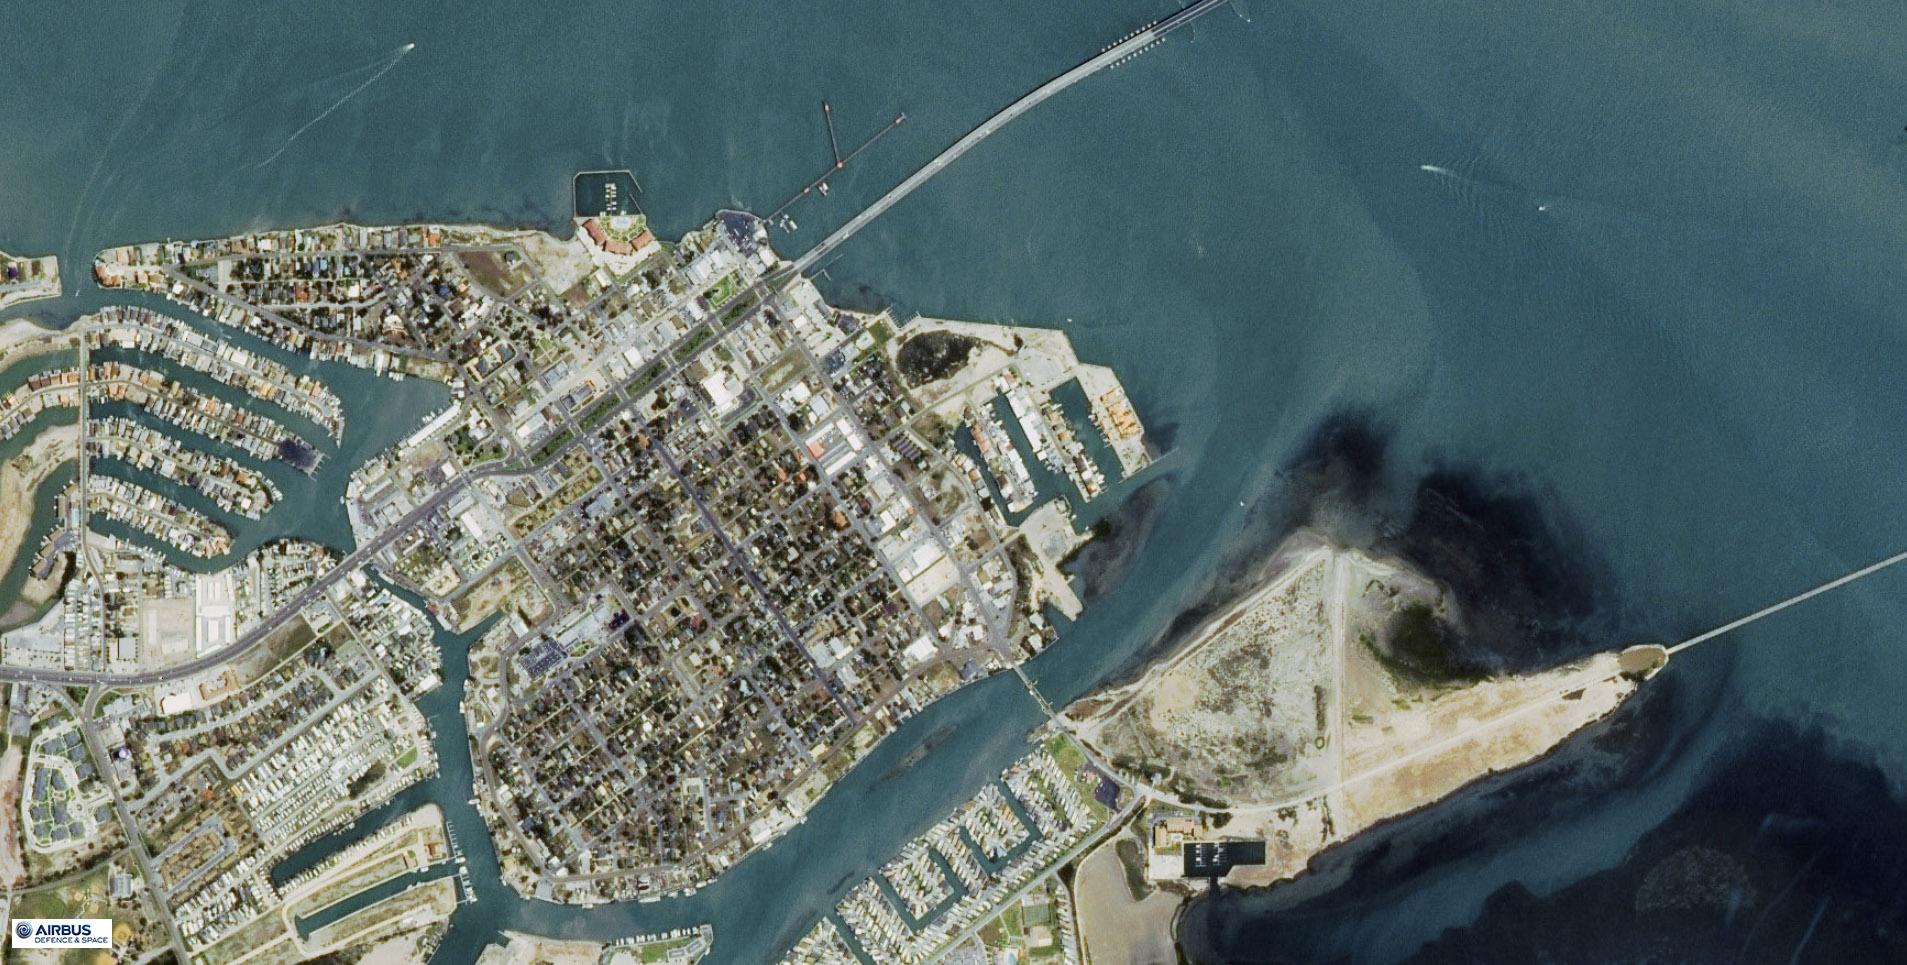 SPOT-7 Satellite Image Port Isabel Texas   Satellite ...